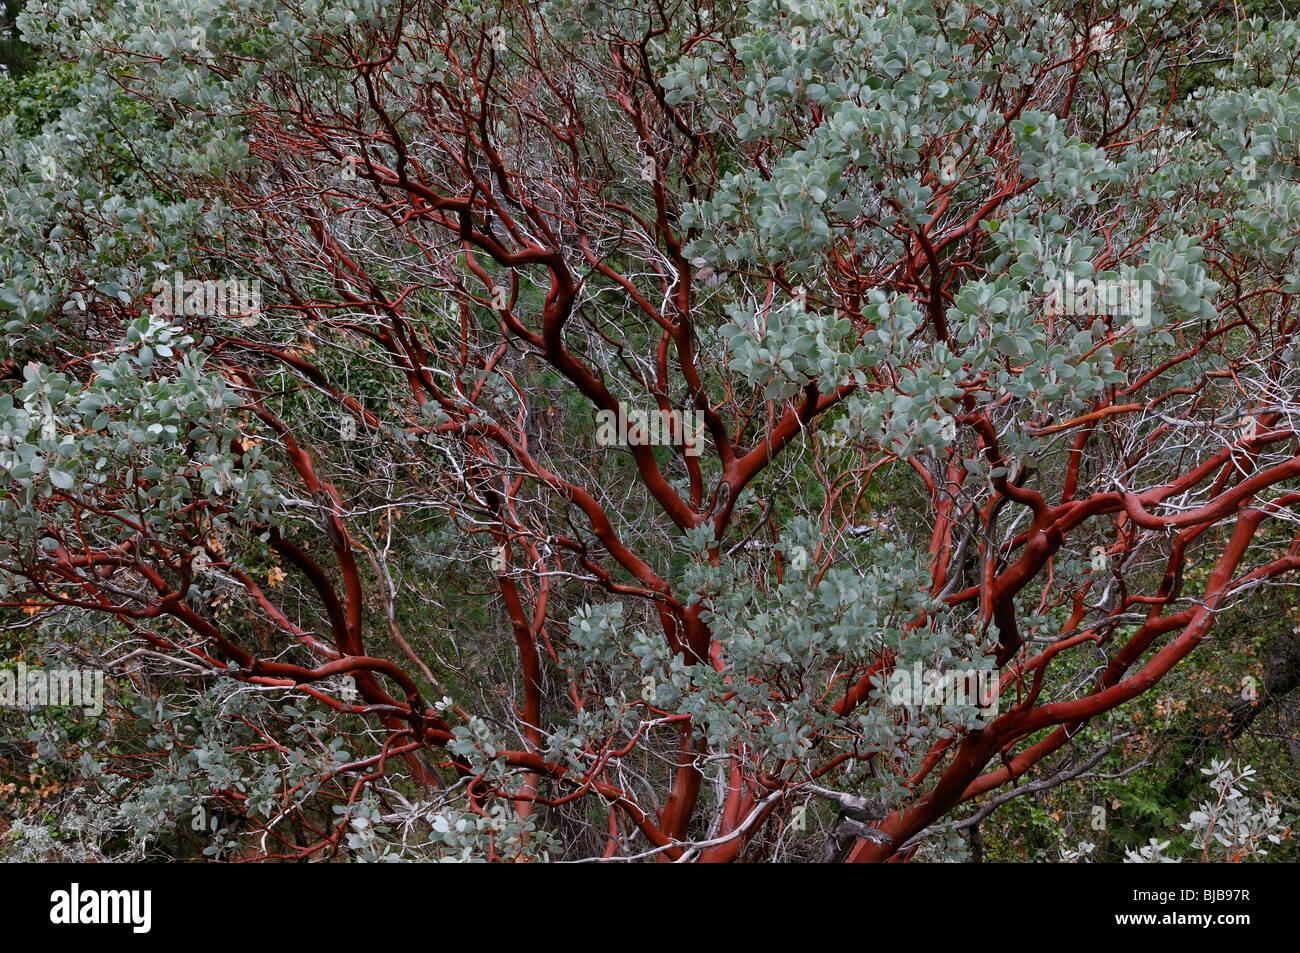 Red bark of the evergreen Manzanita tree in Yosemite National Park in winter - Stock Image